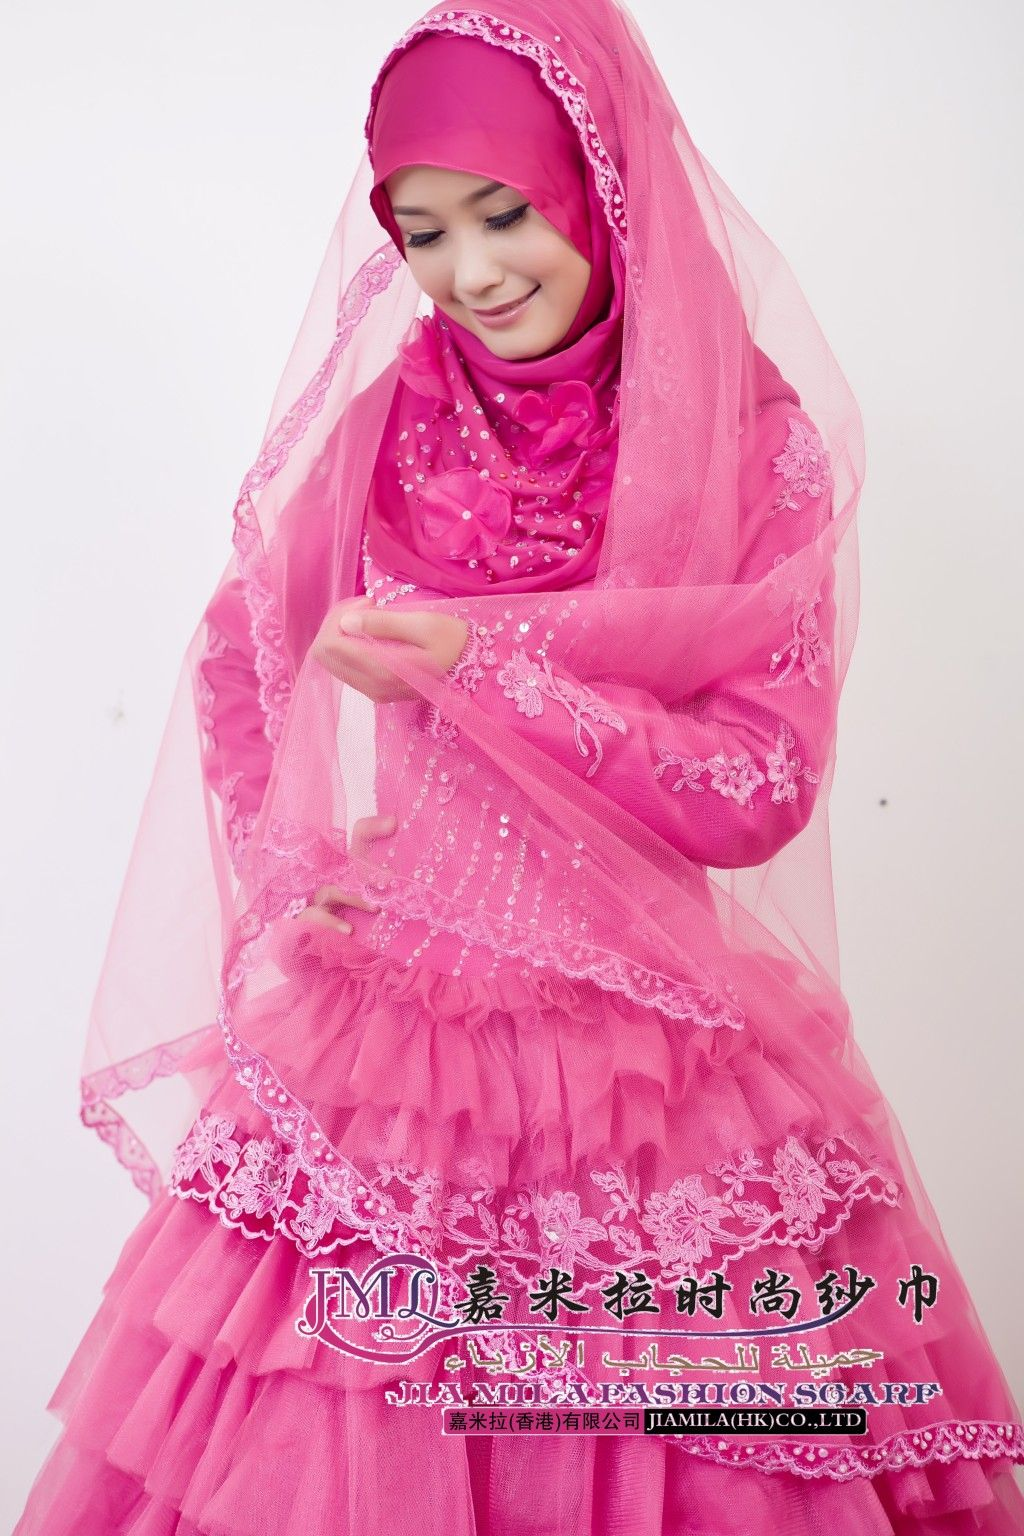 muslim wedding dress muslim wedding dress photo jia mila hui muslim